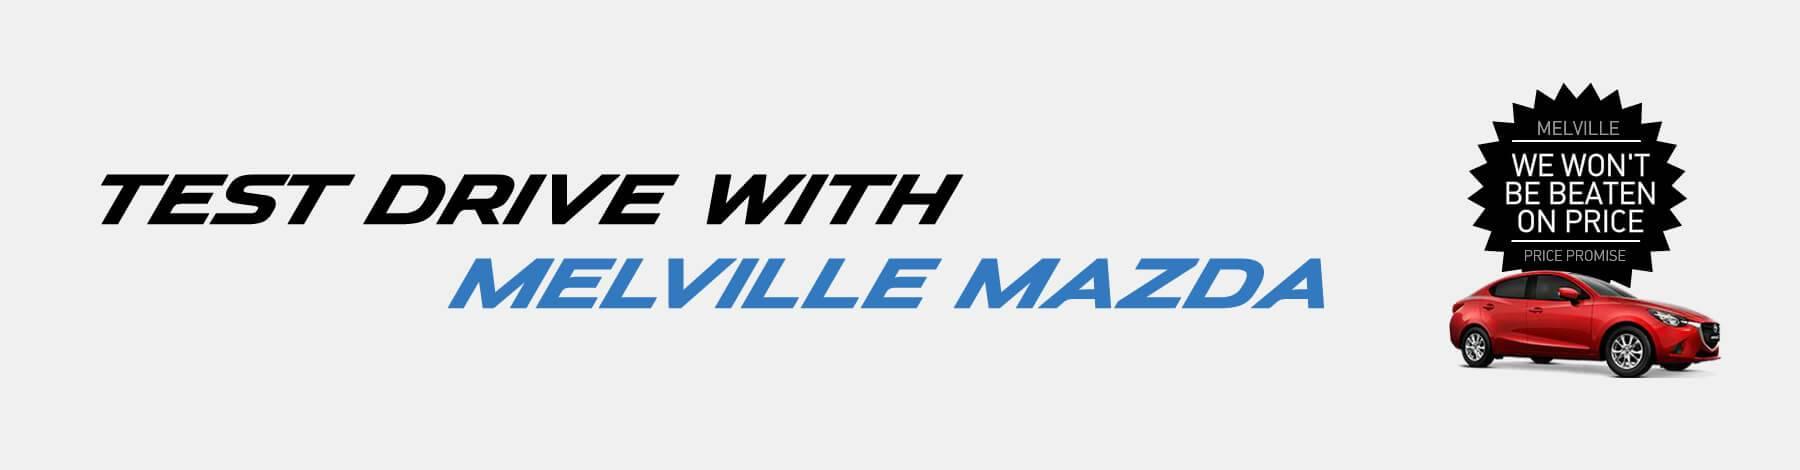 Melville Mazda - Book A Test Drive